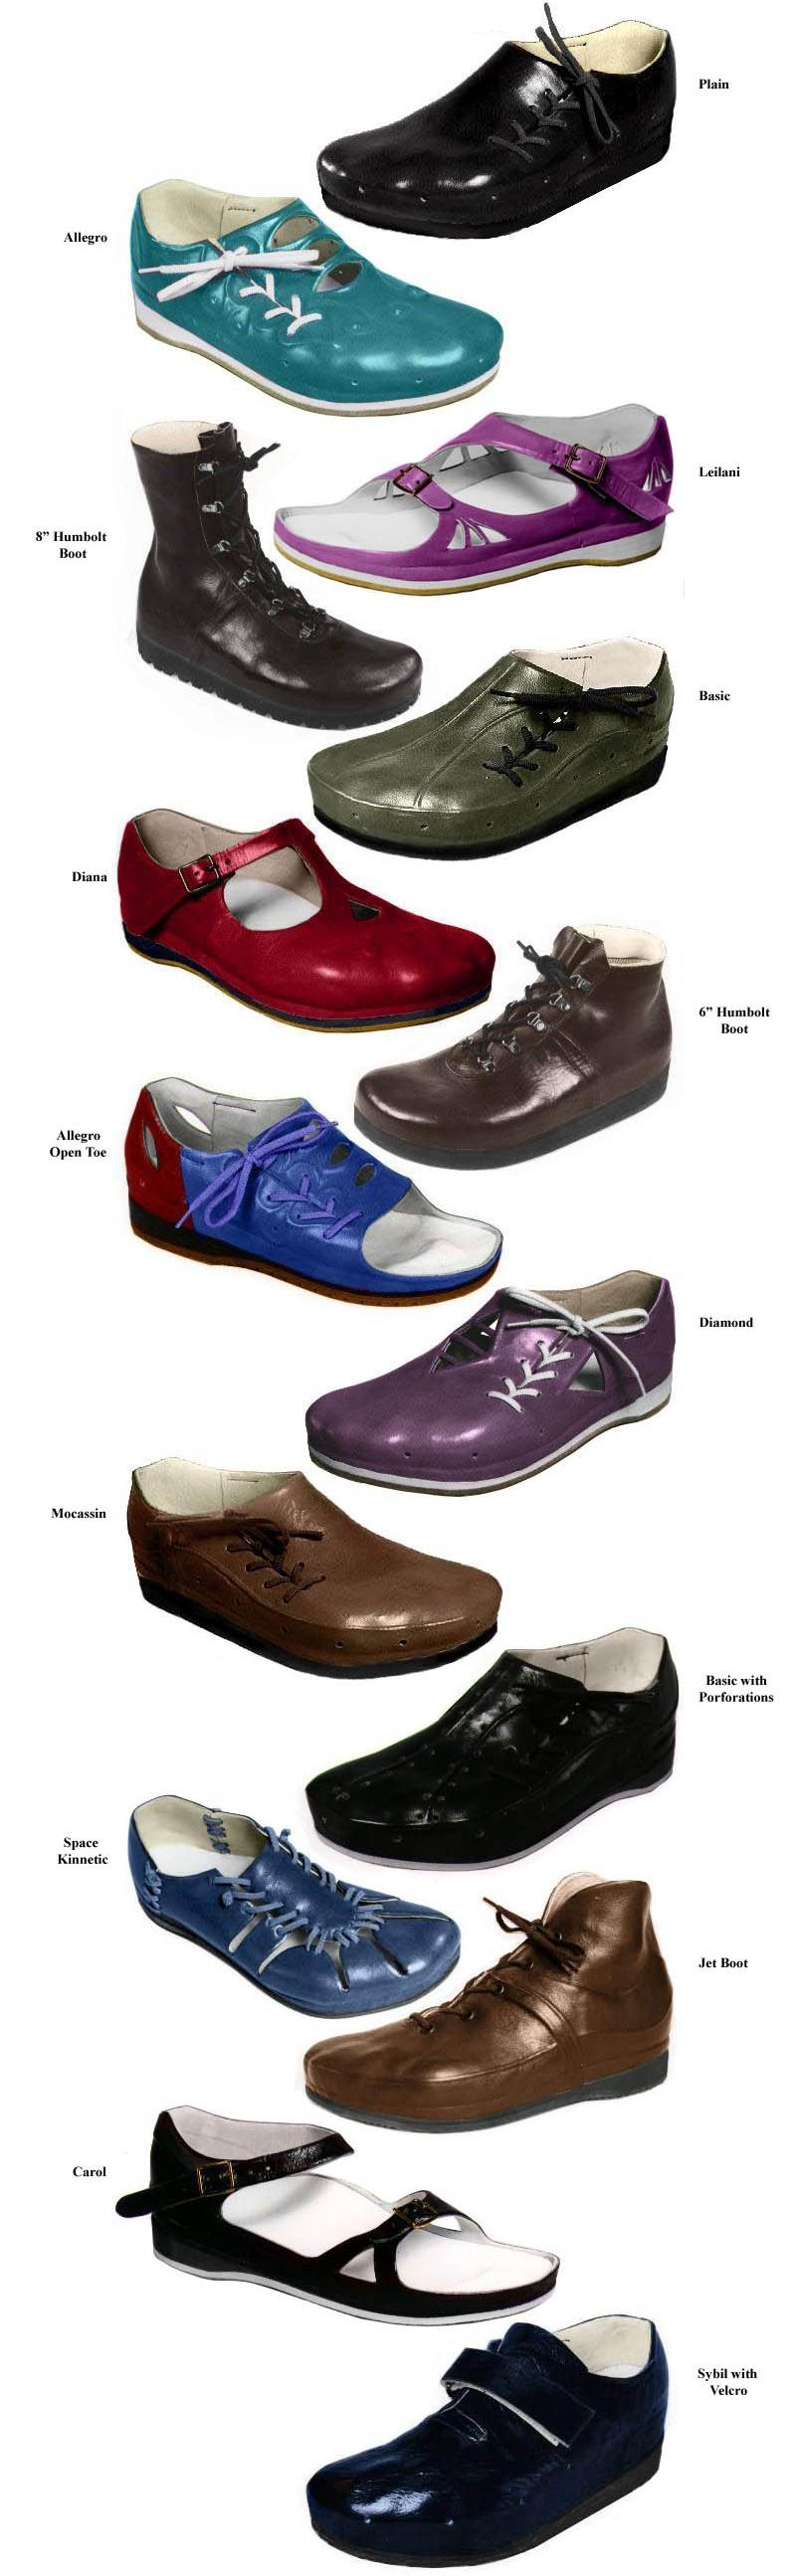 Murray space shoe are custom made